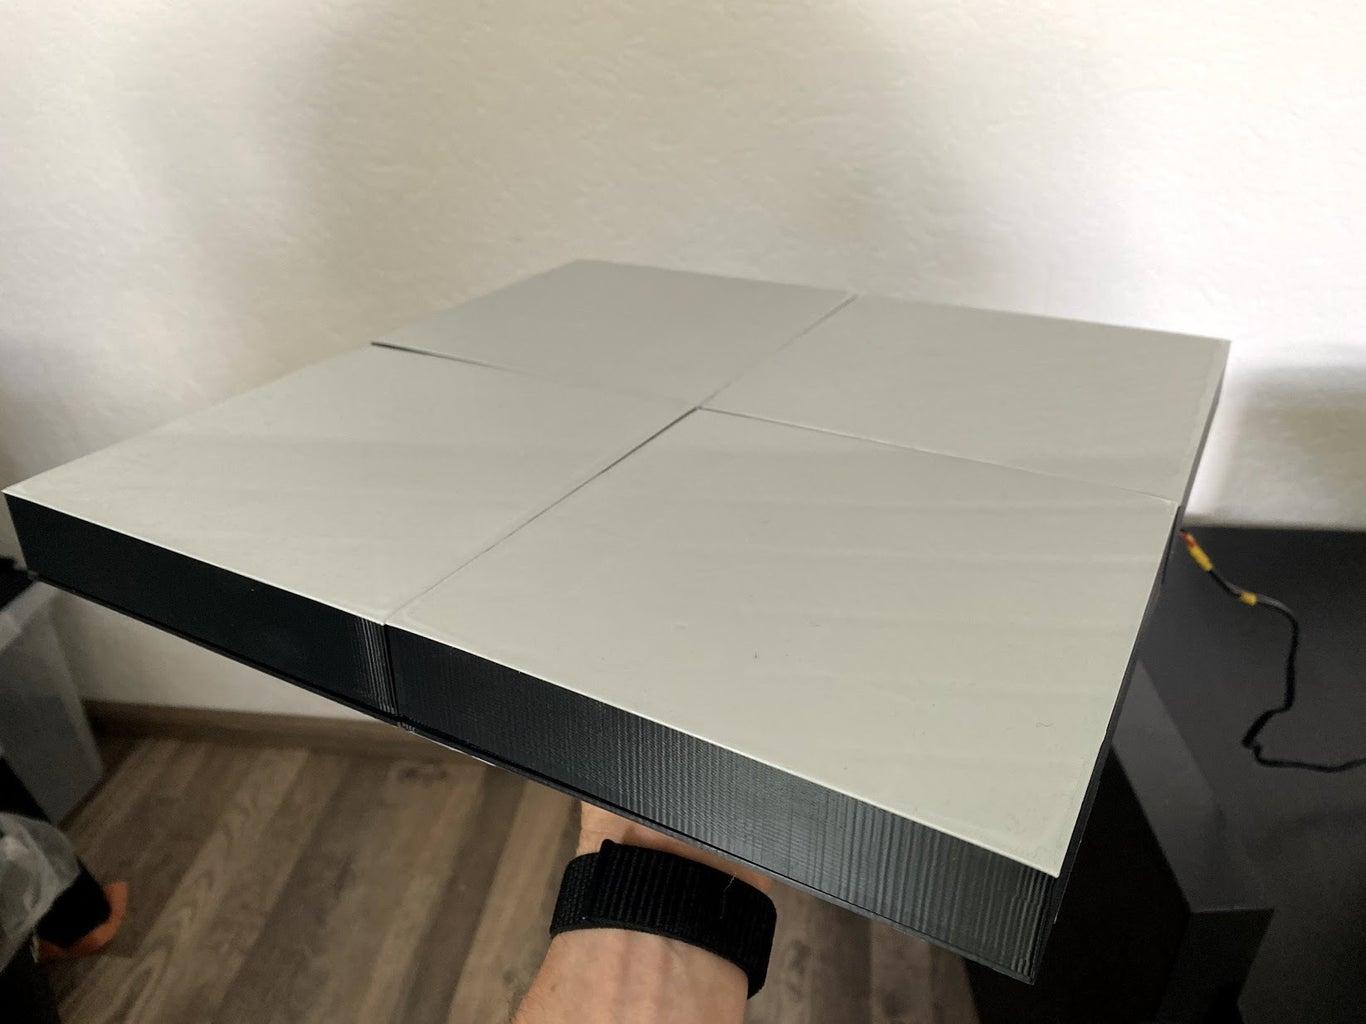 10x10 RGB Matrix (3D-Printed) With Adalight Protocol